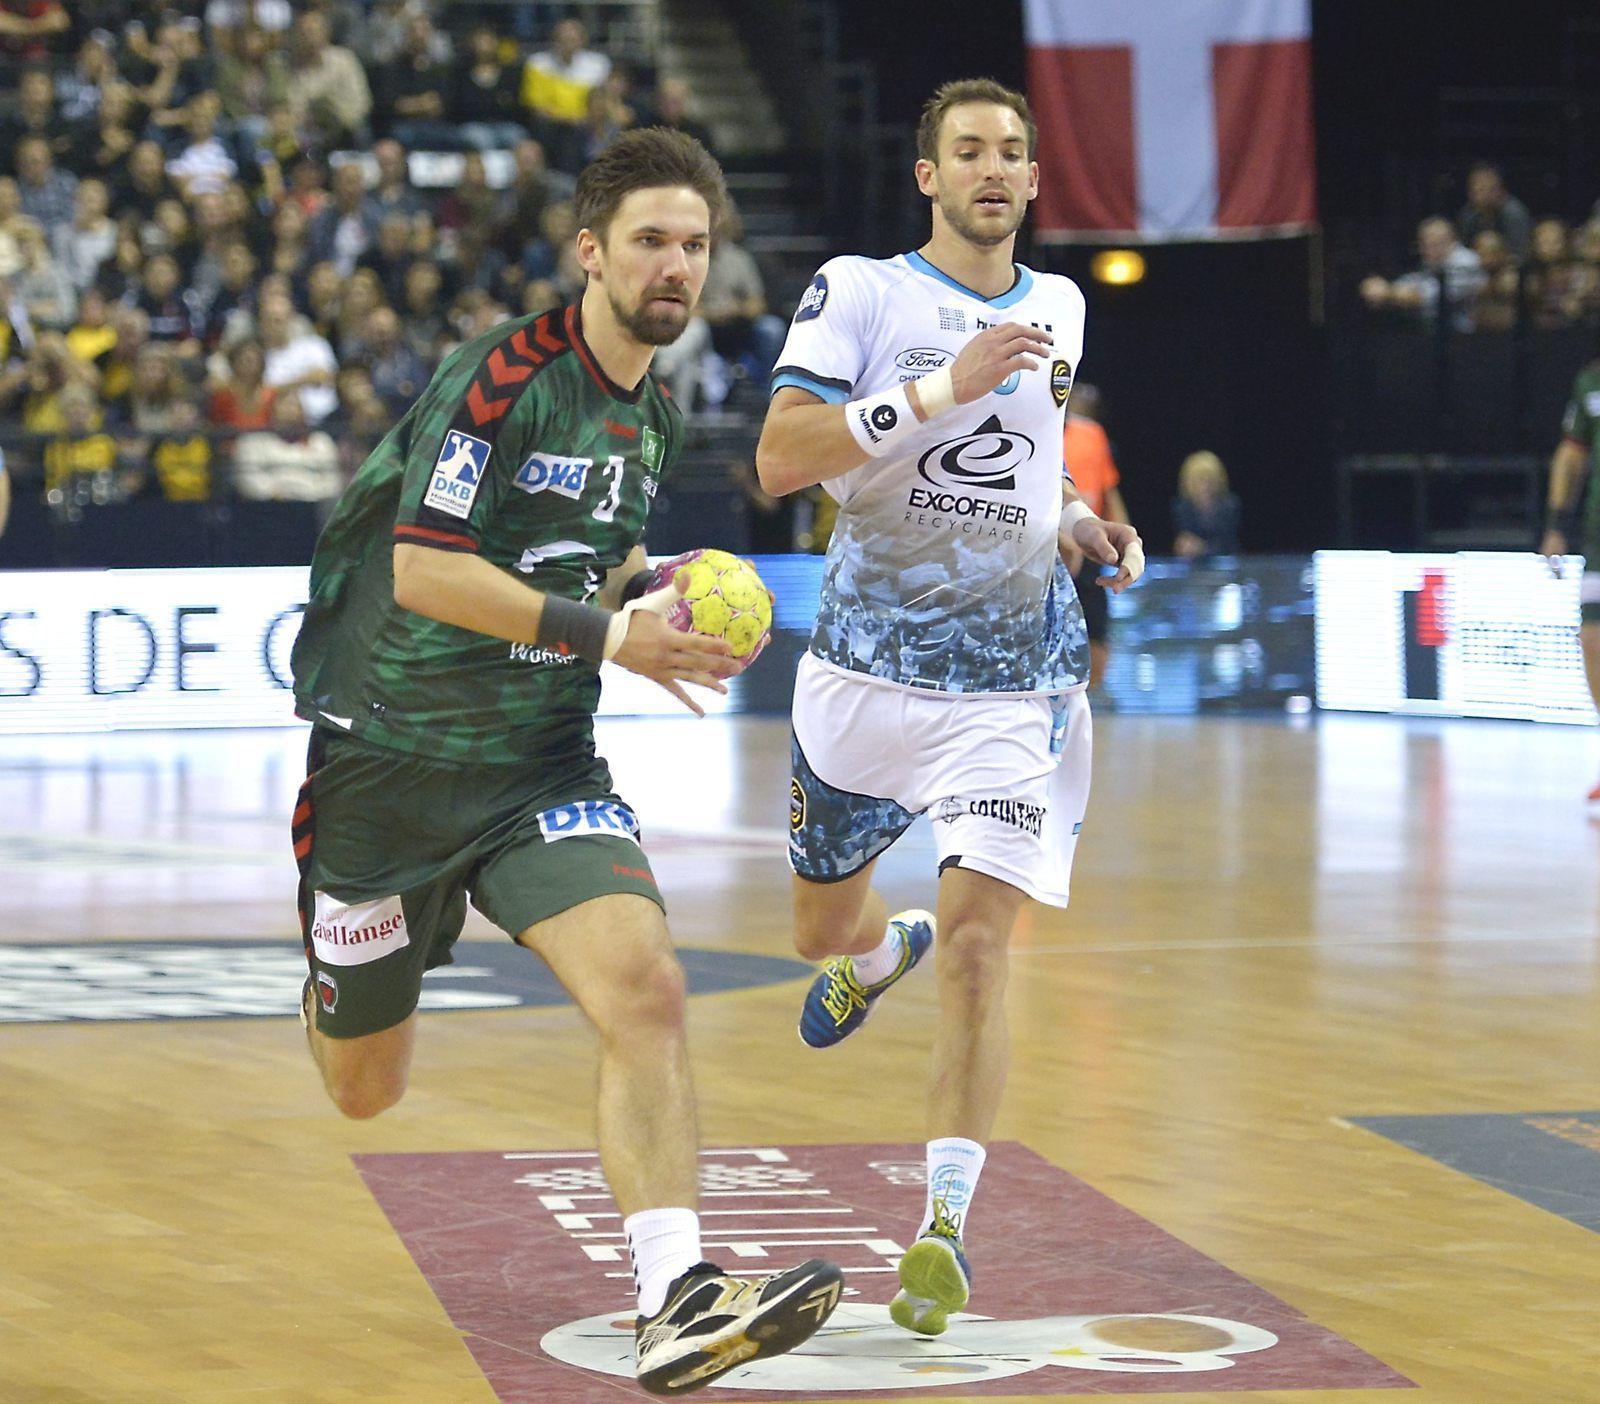 EHF CHAMBERY - BERLIN le match retour sera décisif